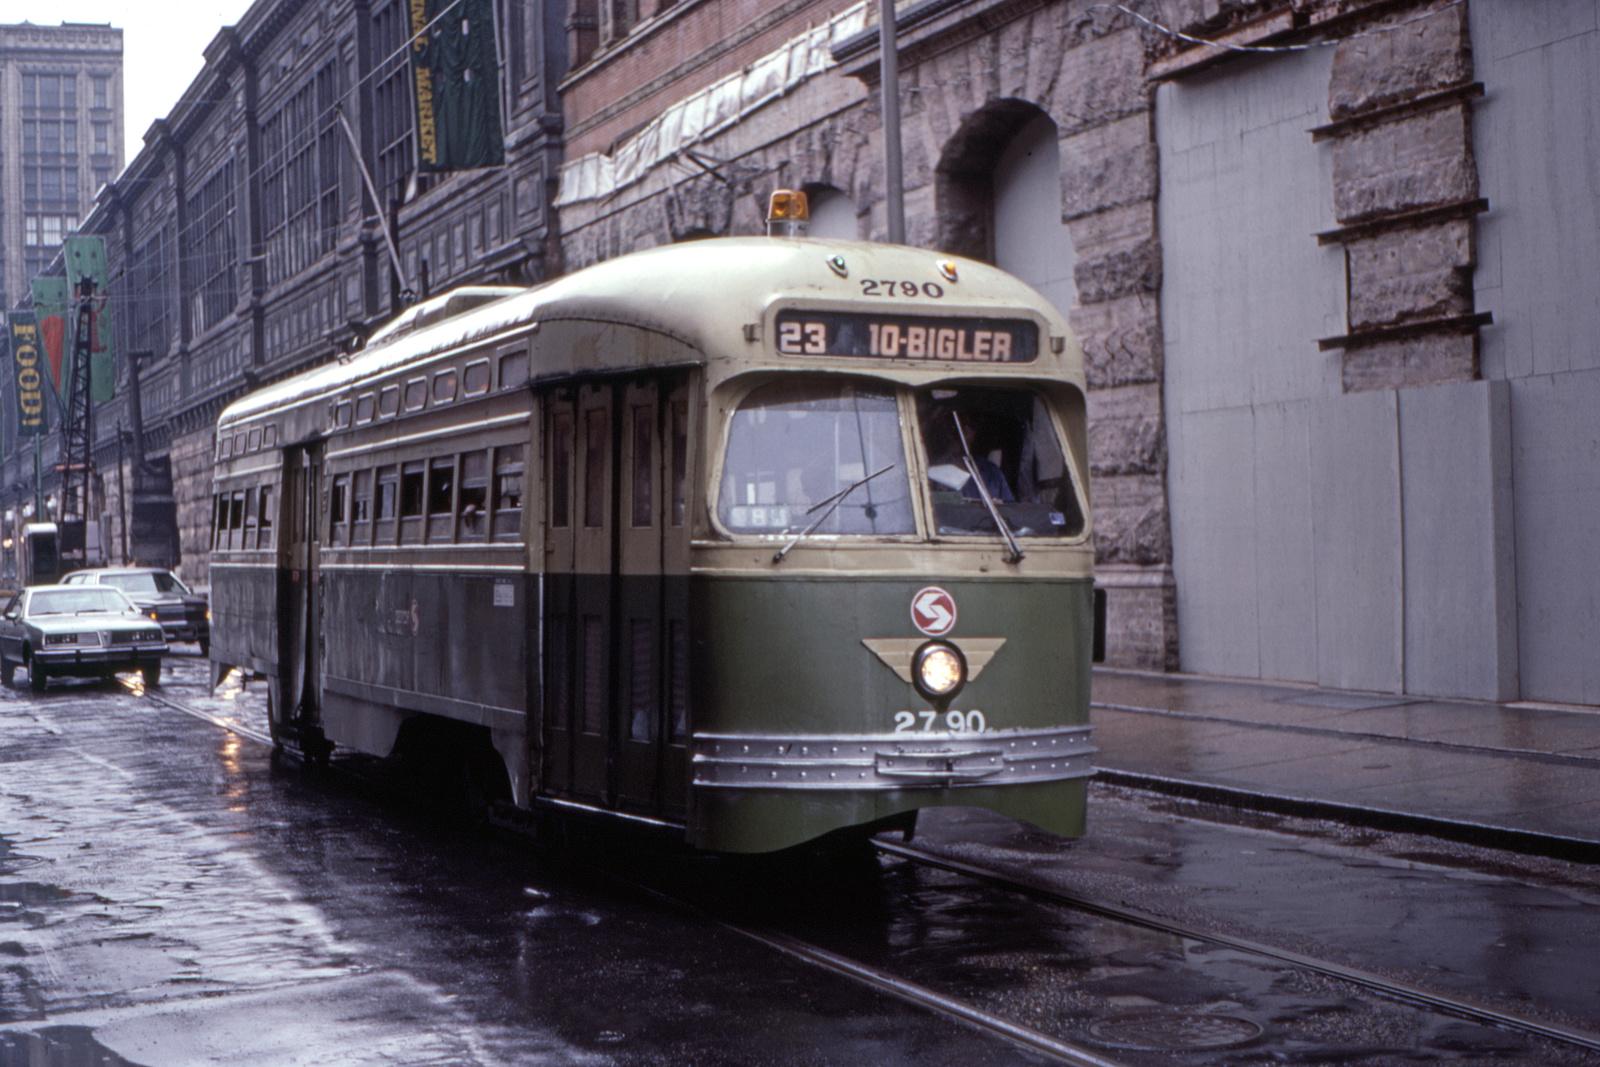 (706k, 1600x1067)<br><b>Country:</b> United States<br><b>City:</b> Philadelphia, PA<br><b>System:</b> SEPTA (or Predecessor)<br><b>Line:</b> Rt. 23-Germantown<br><b>Location:</b> 12th/Filbert<br><b>Car:</b> PTC/SEPTA Postwar All-electric PCC (St.Louis, 1947) 2790 <br><b>Collection of:</b> David Pirmann<br><b>Date:</b> 5/22/1983<br><b>Viewed (this week/total):</b> 0 / 62